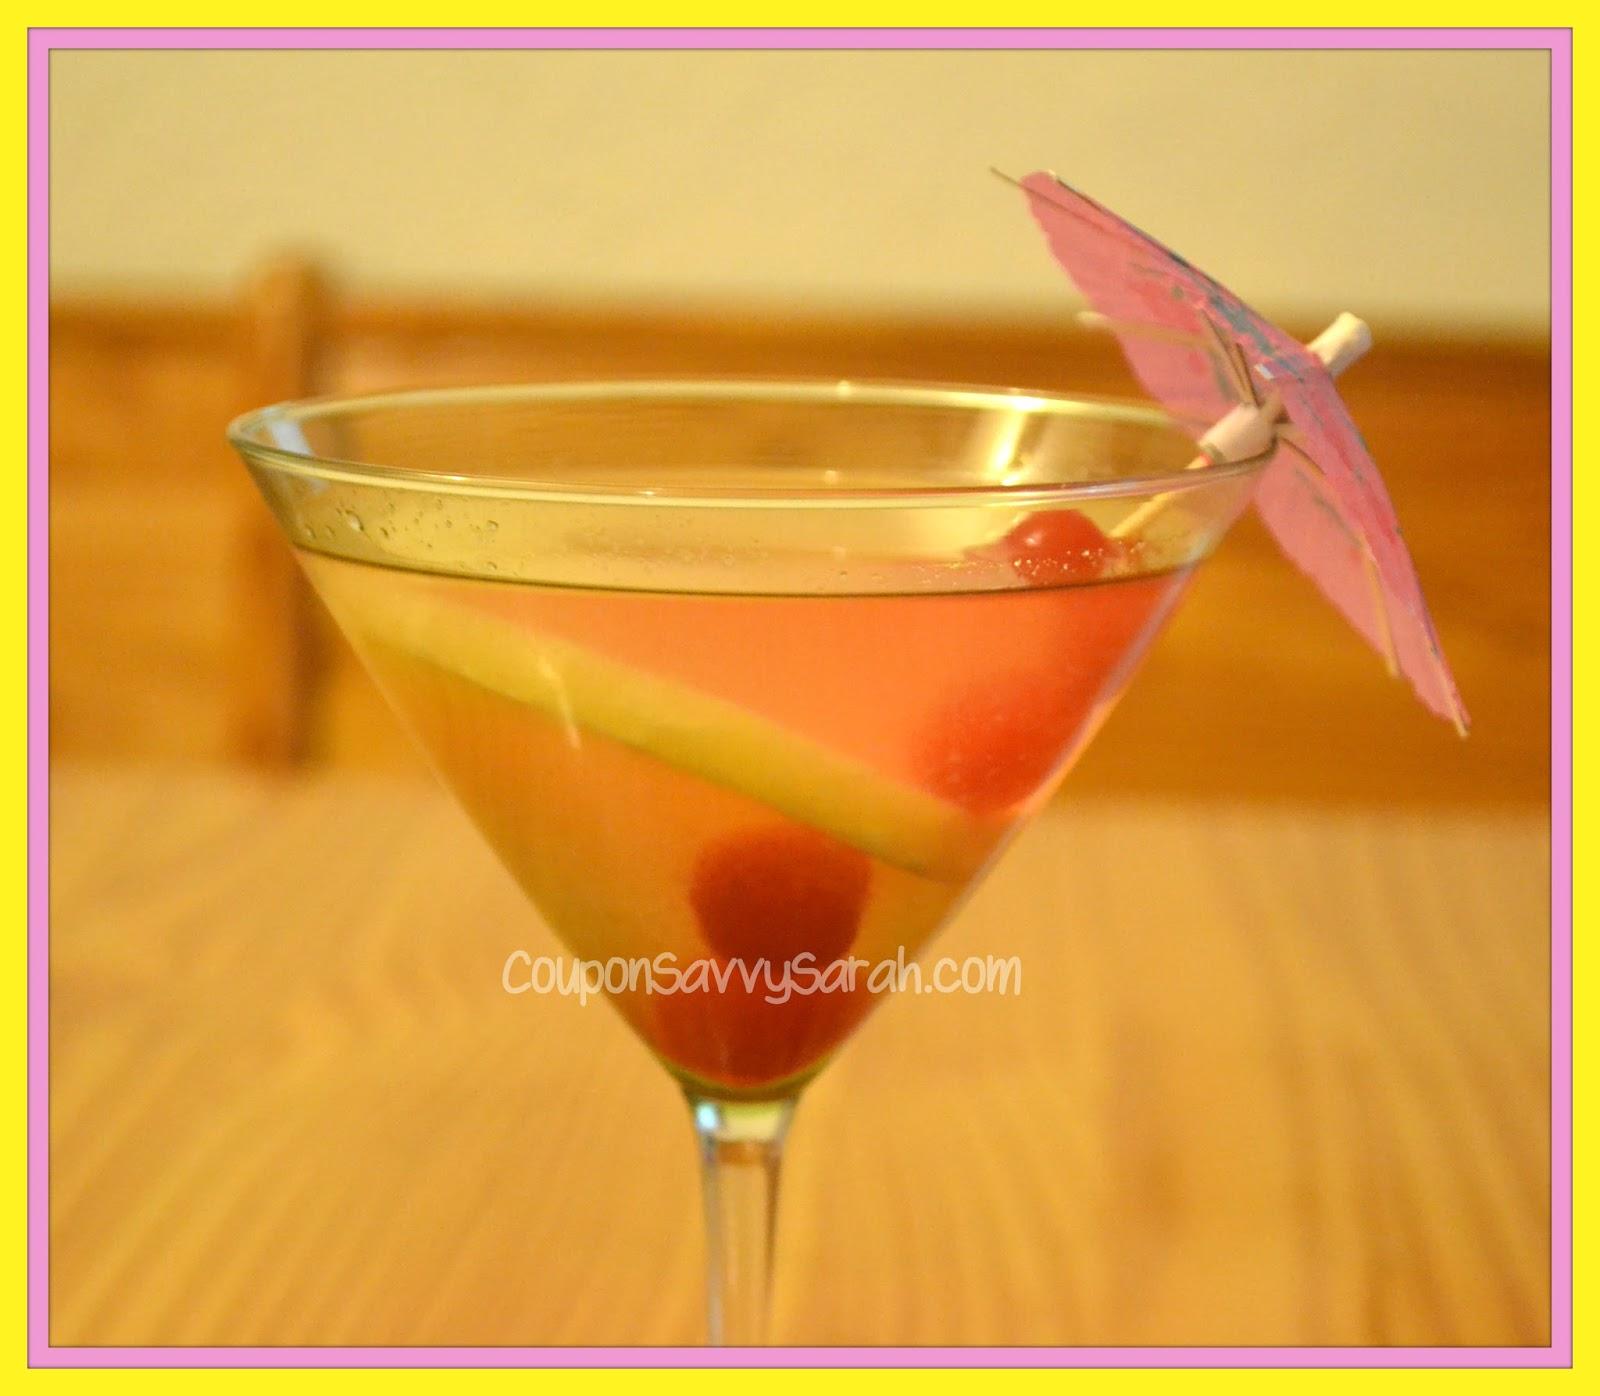 Coupon Savvy Sarah: Pineapple Upside Down Cake Martini Recipe